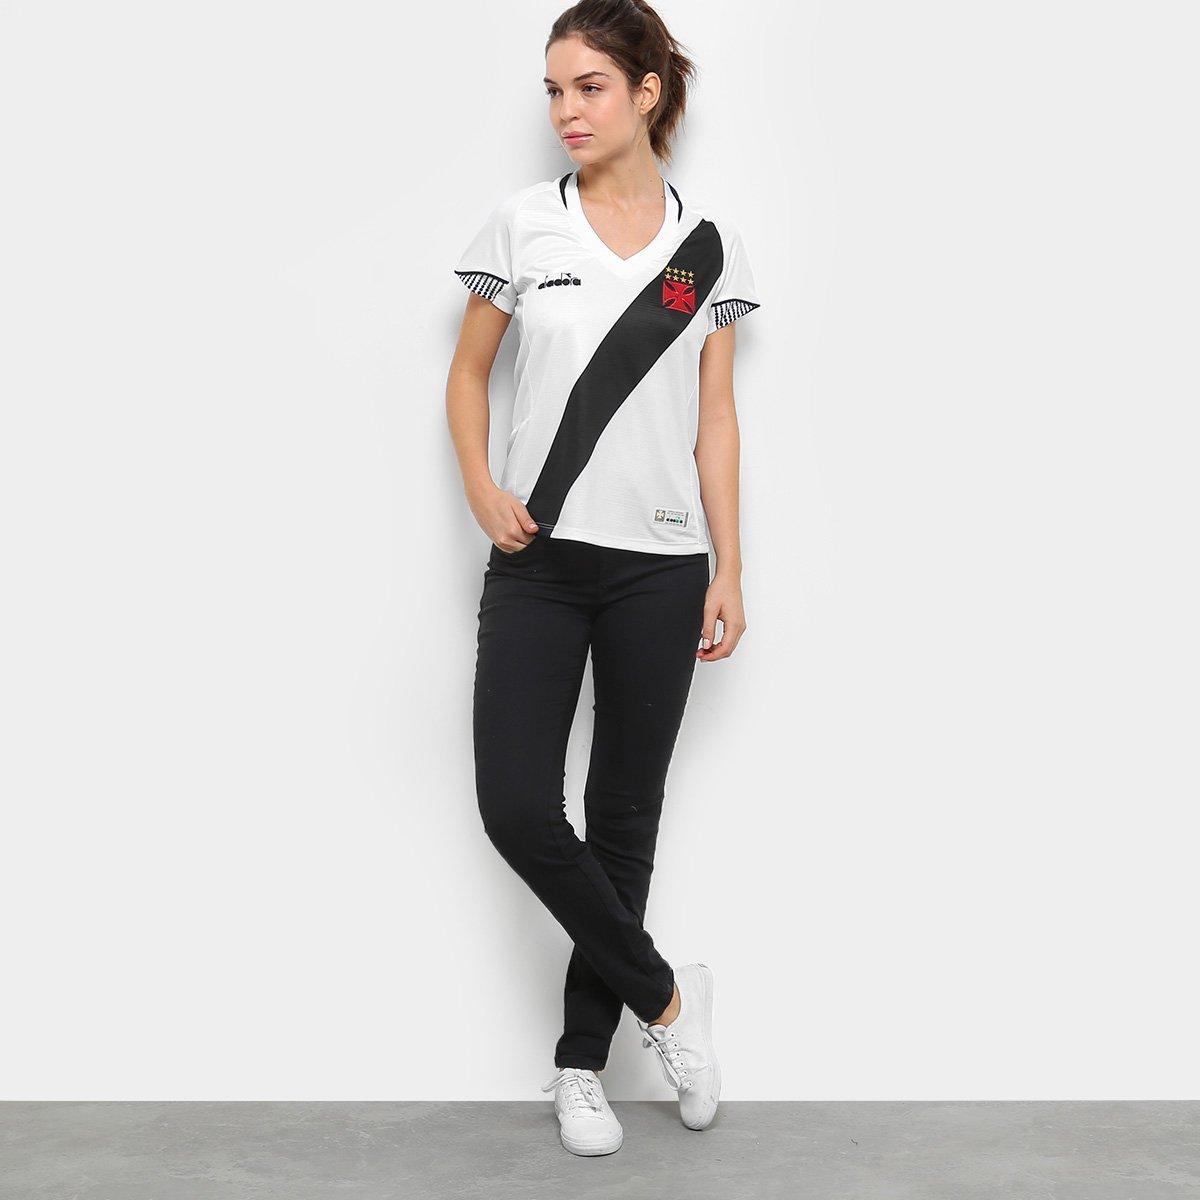 Camisa Vasco II 2018 s n° Torcedor Diadora Feminina - Branco ... 112de94d5c57f